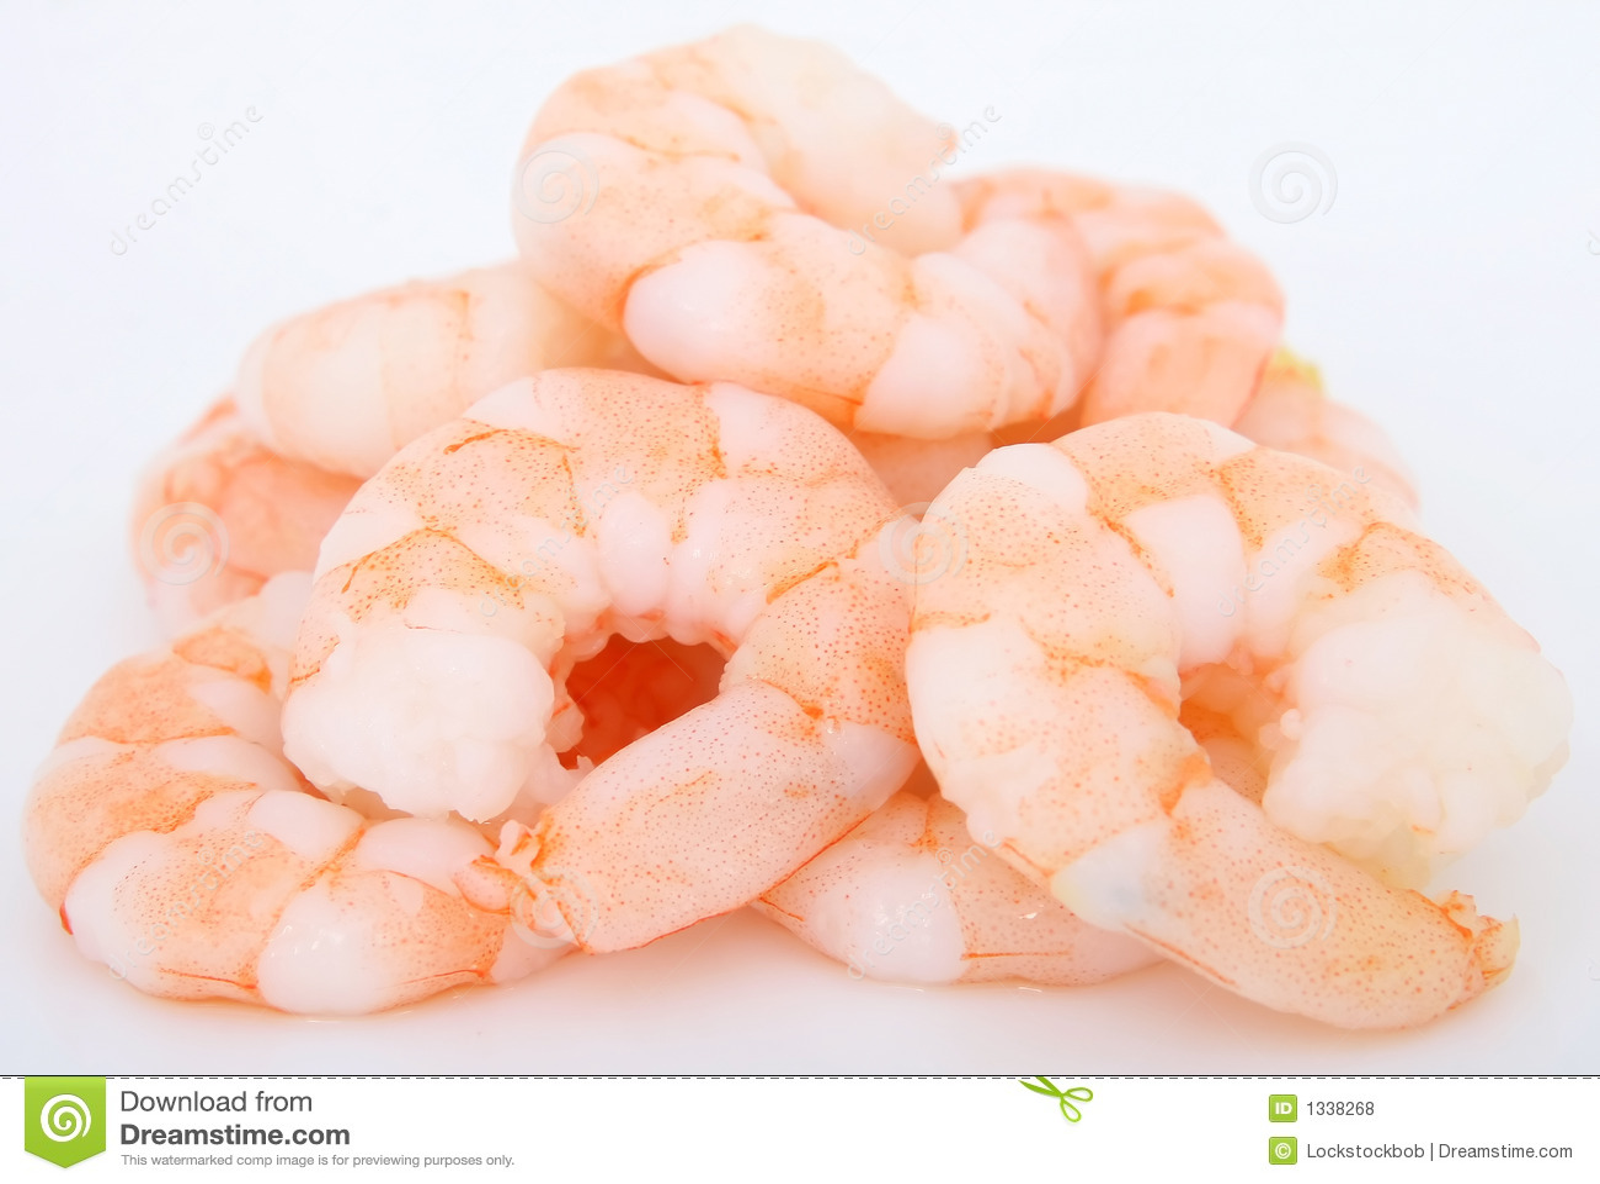 Peeled prawns